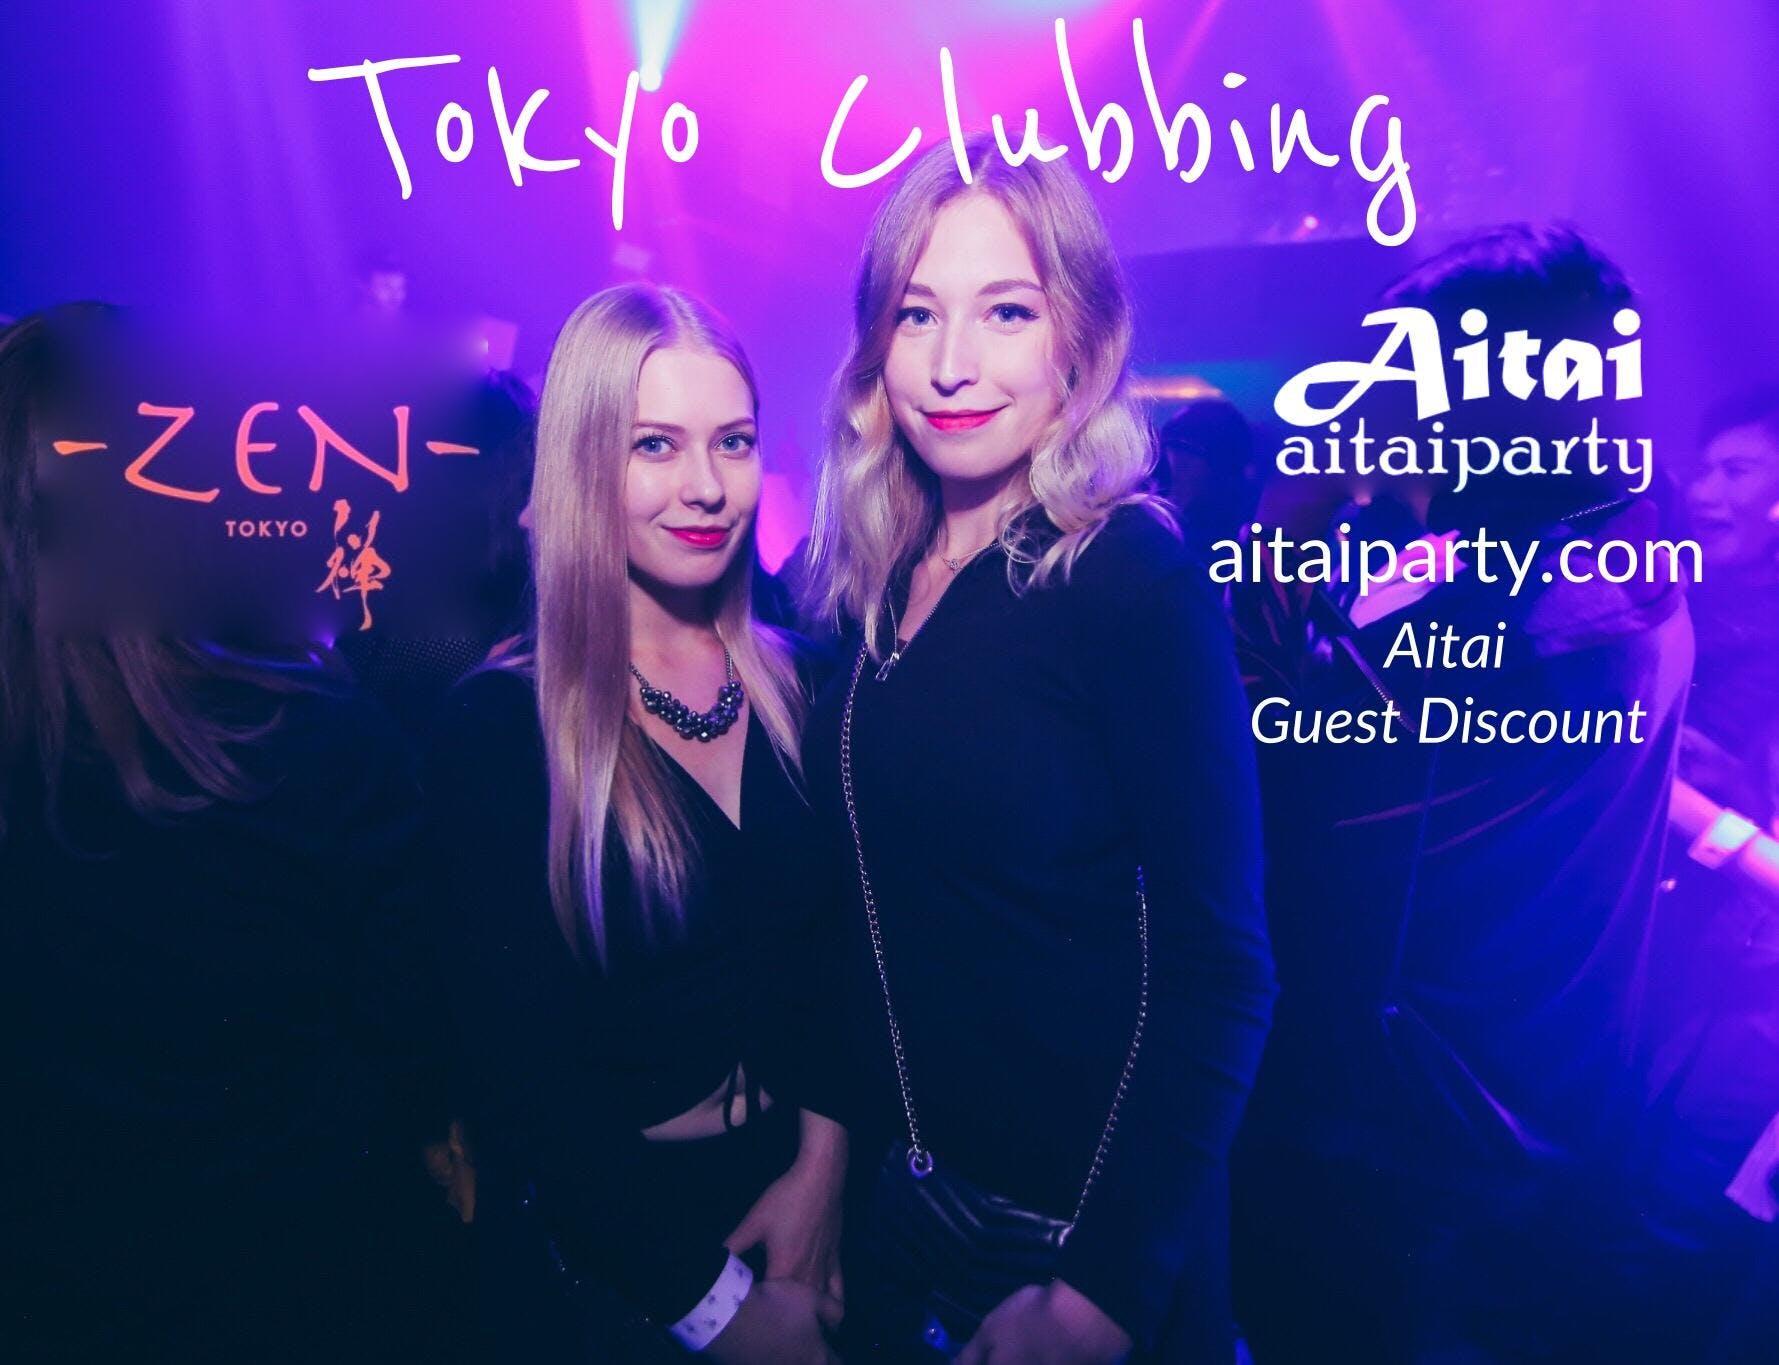 Tokyo Clubbing Party Roppongi Best Disco ZEN Club L:Free+1d-M:1000/3d Aitai